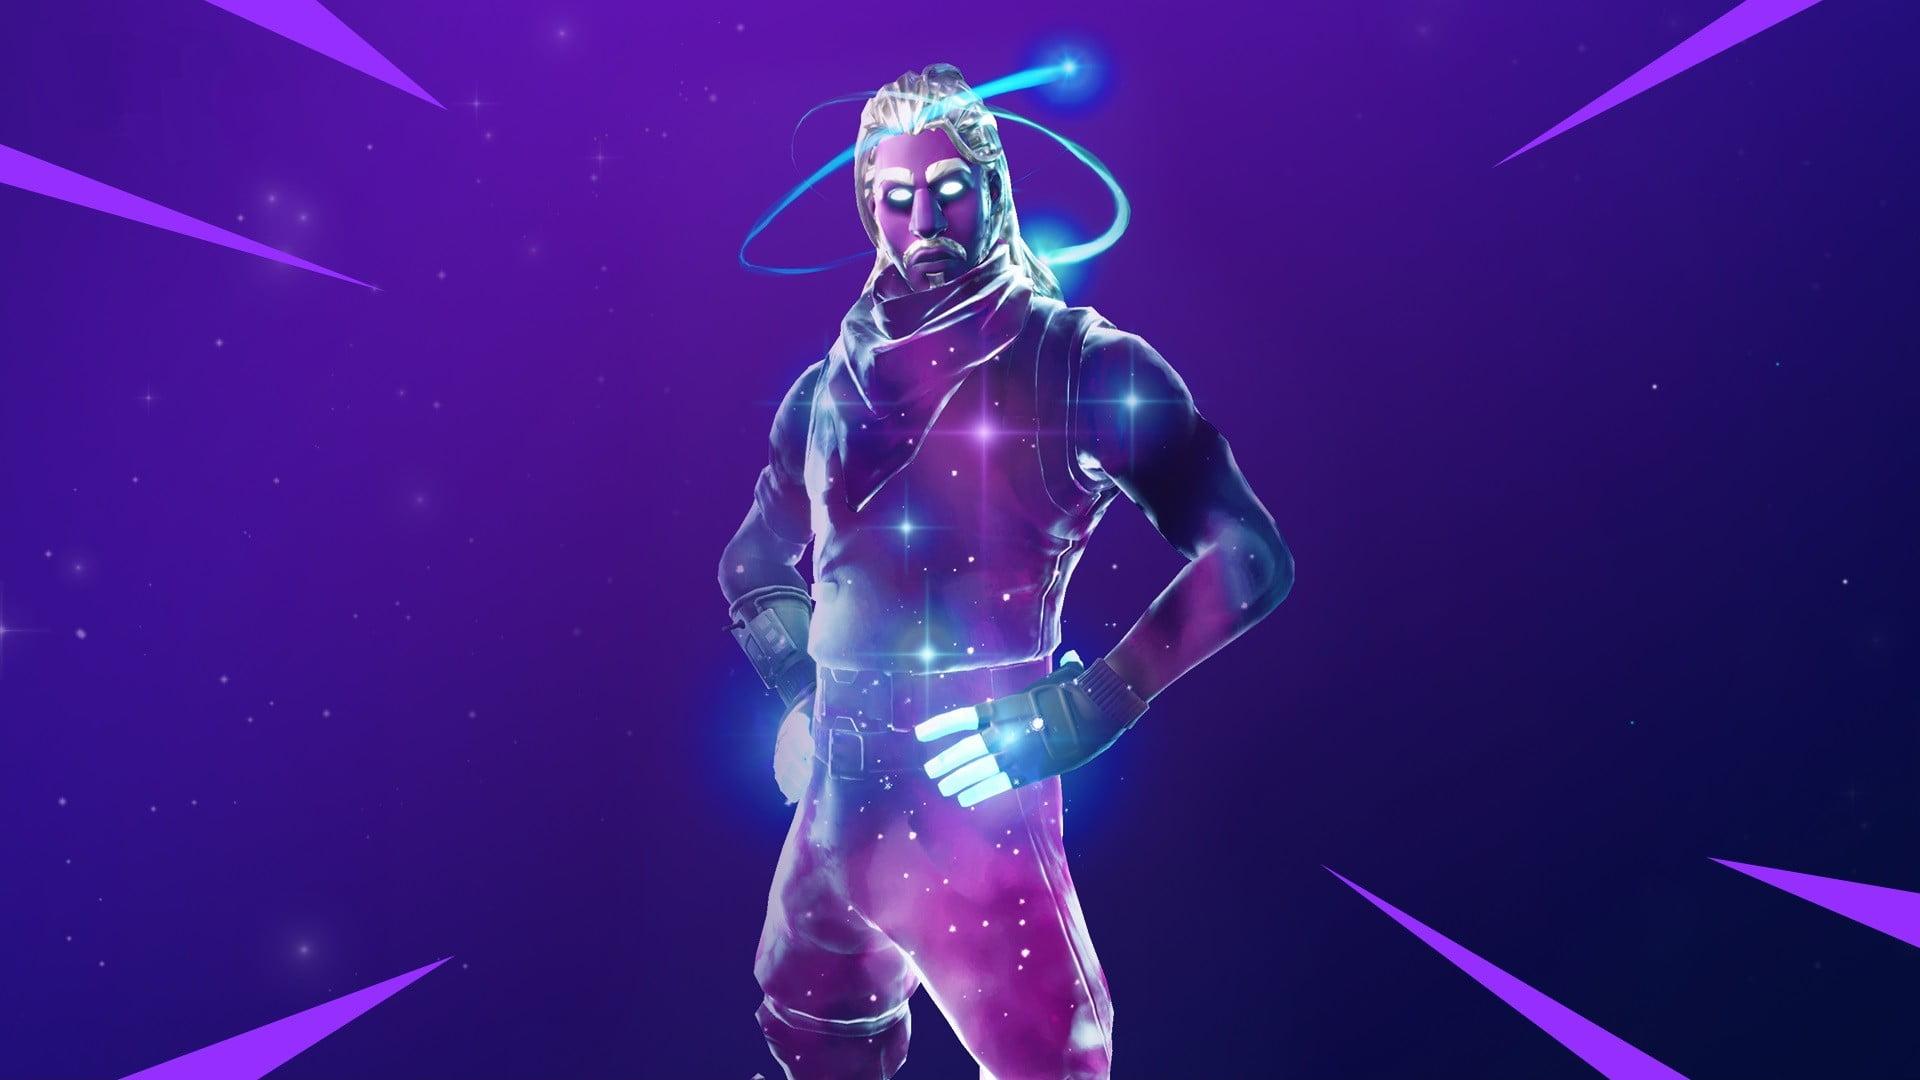 Galaxy Background Renegade Raider Wallpaper Cool